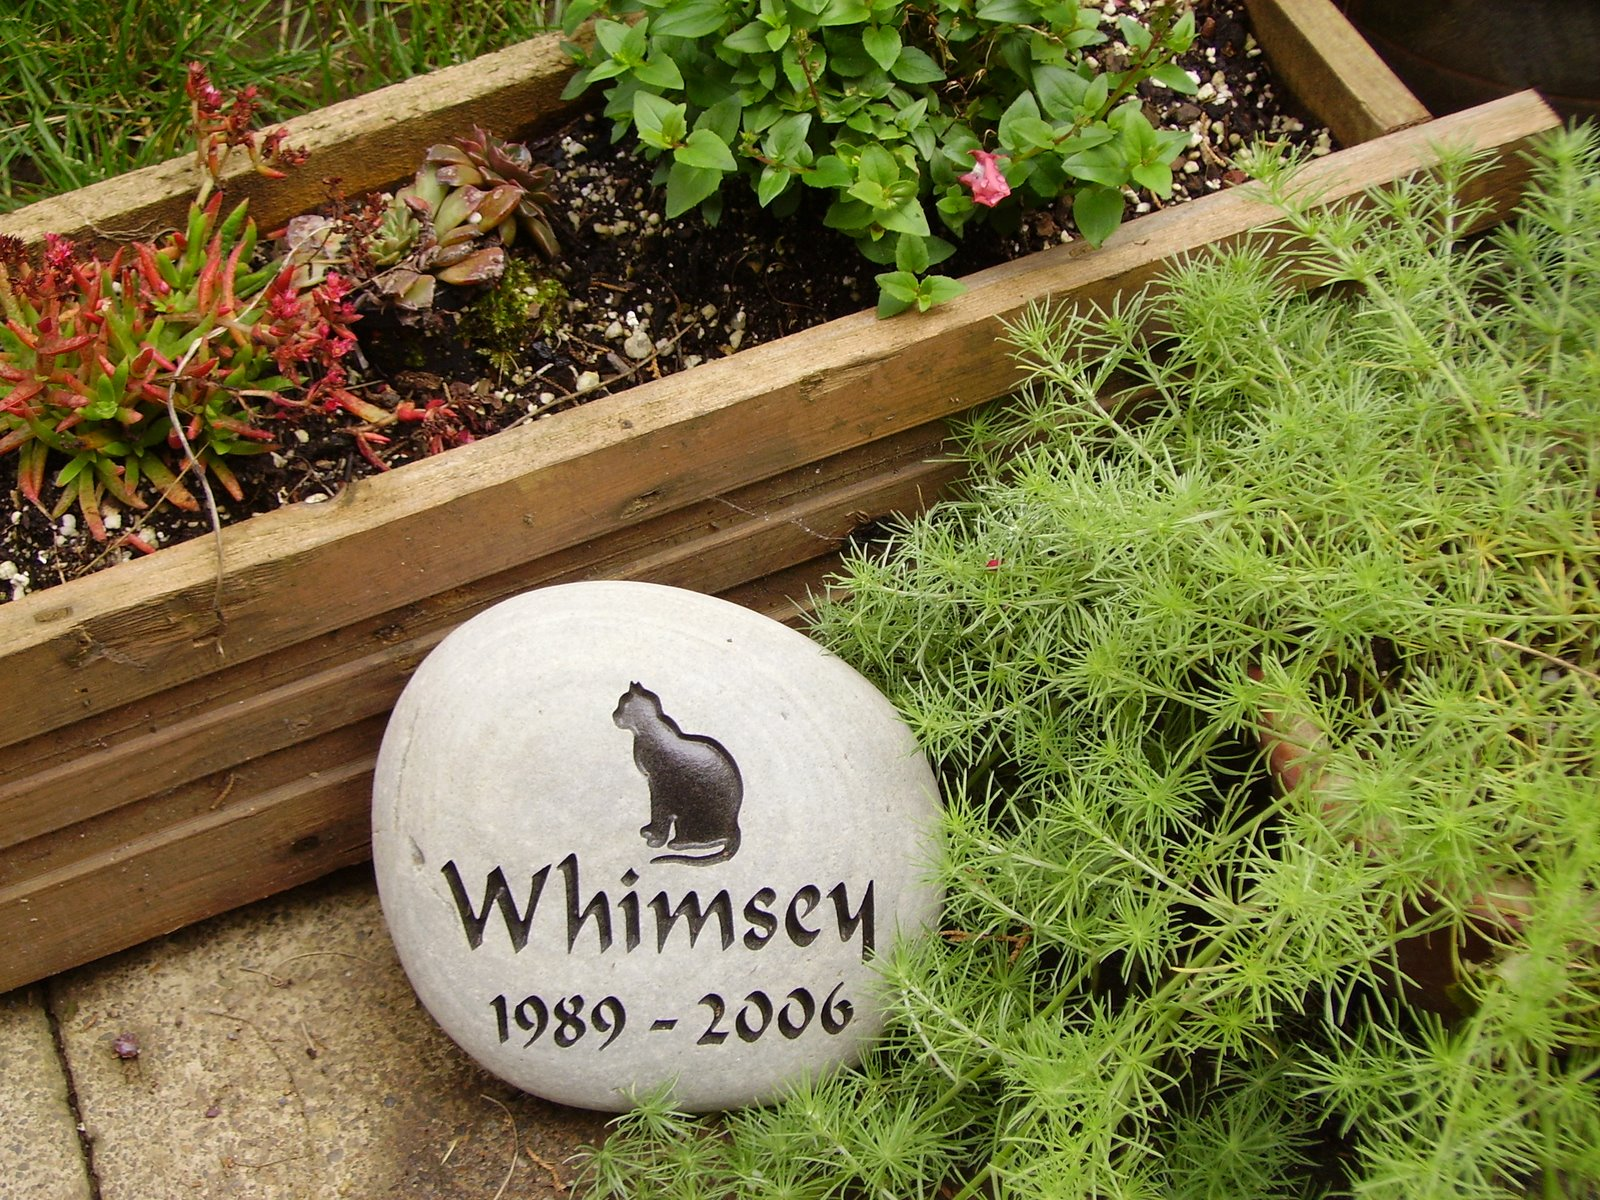 [Whimsey+stone]